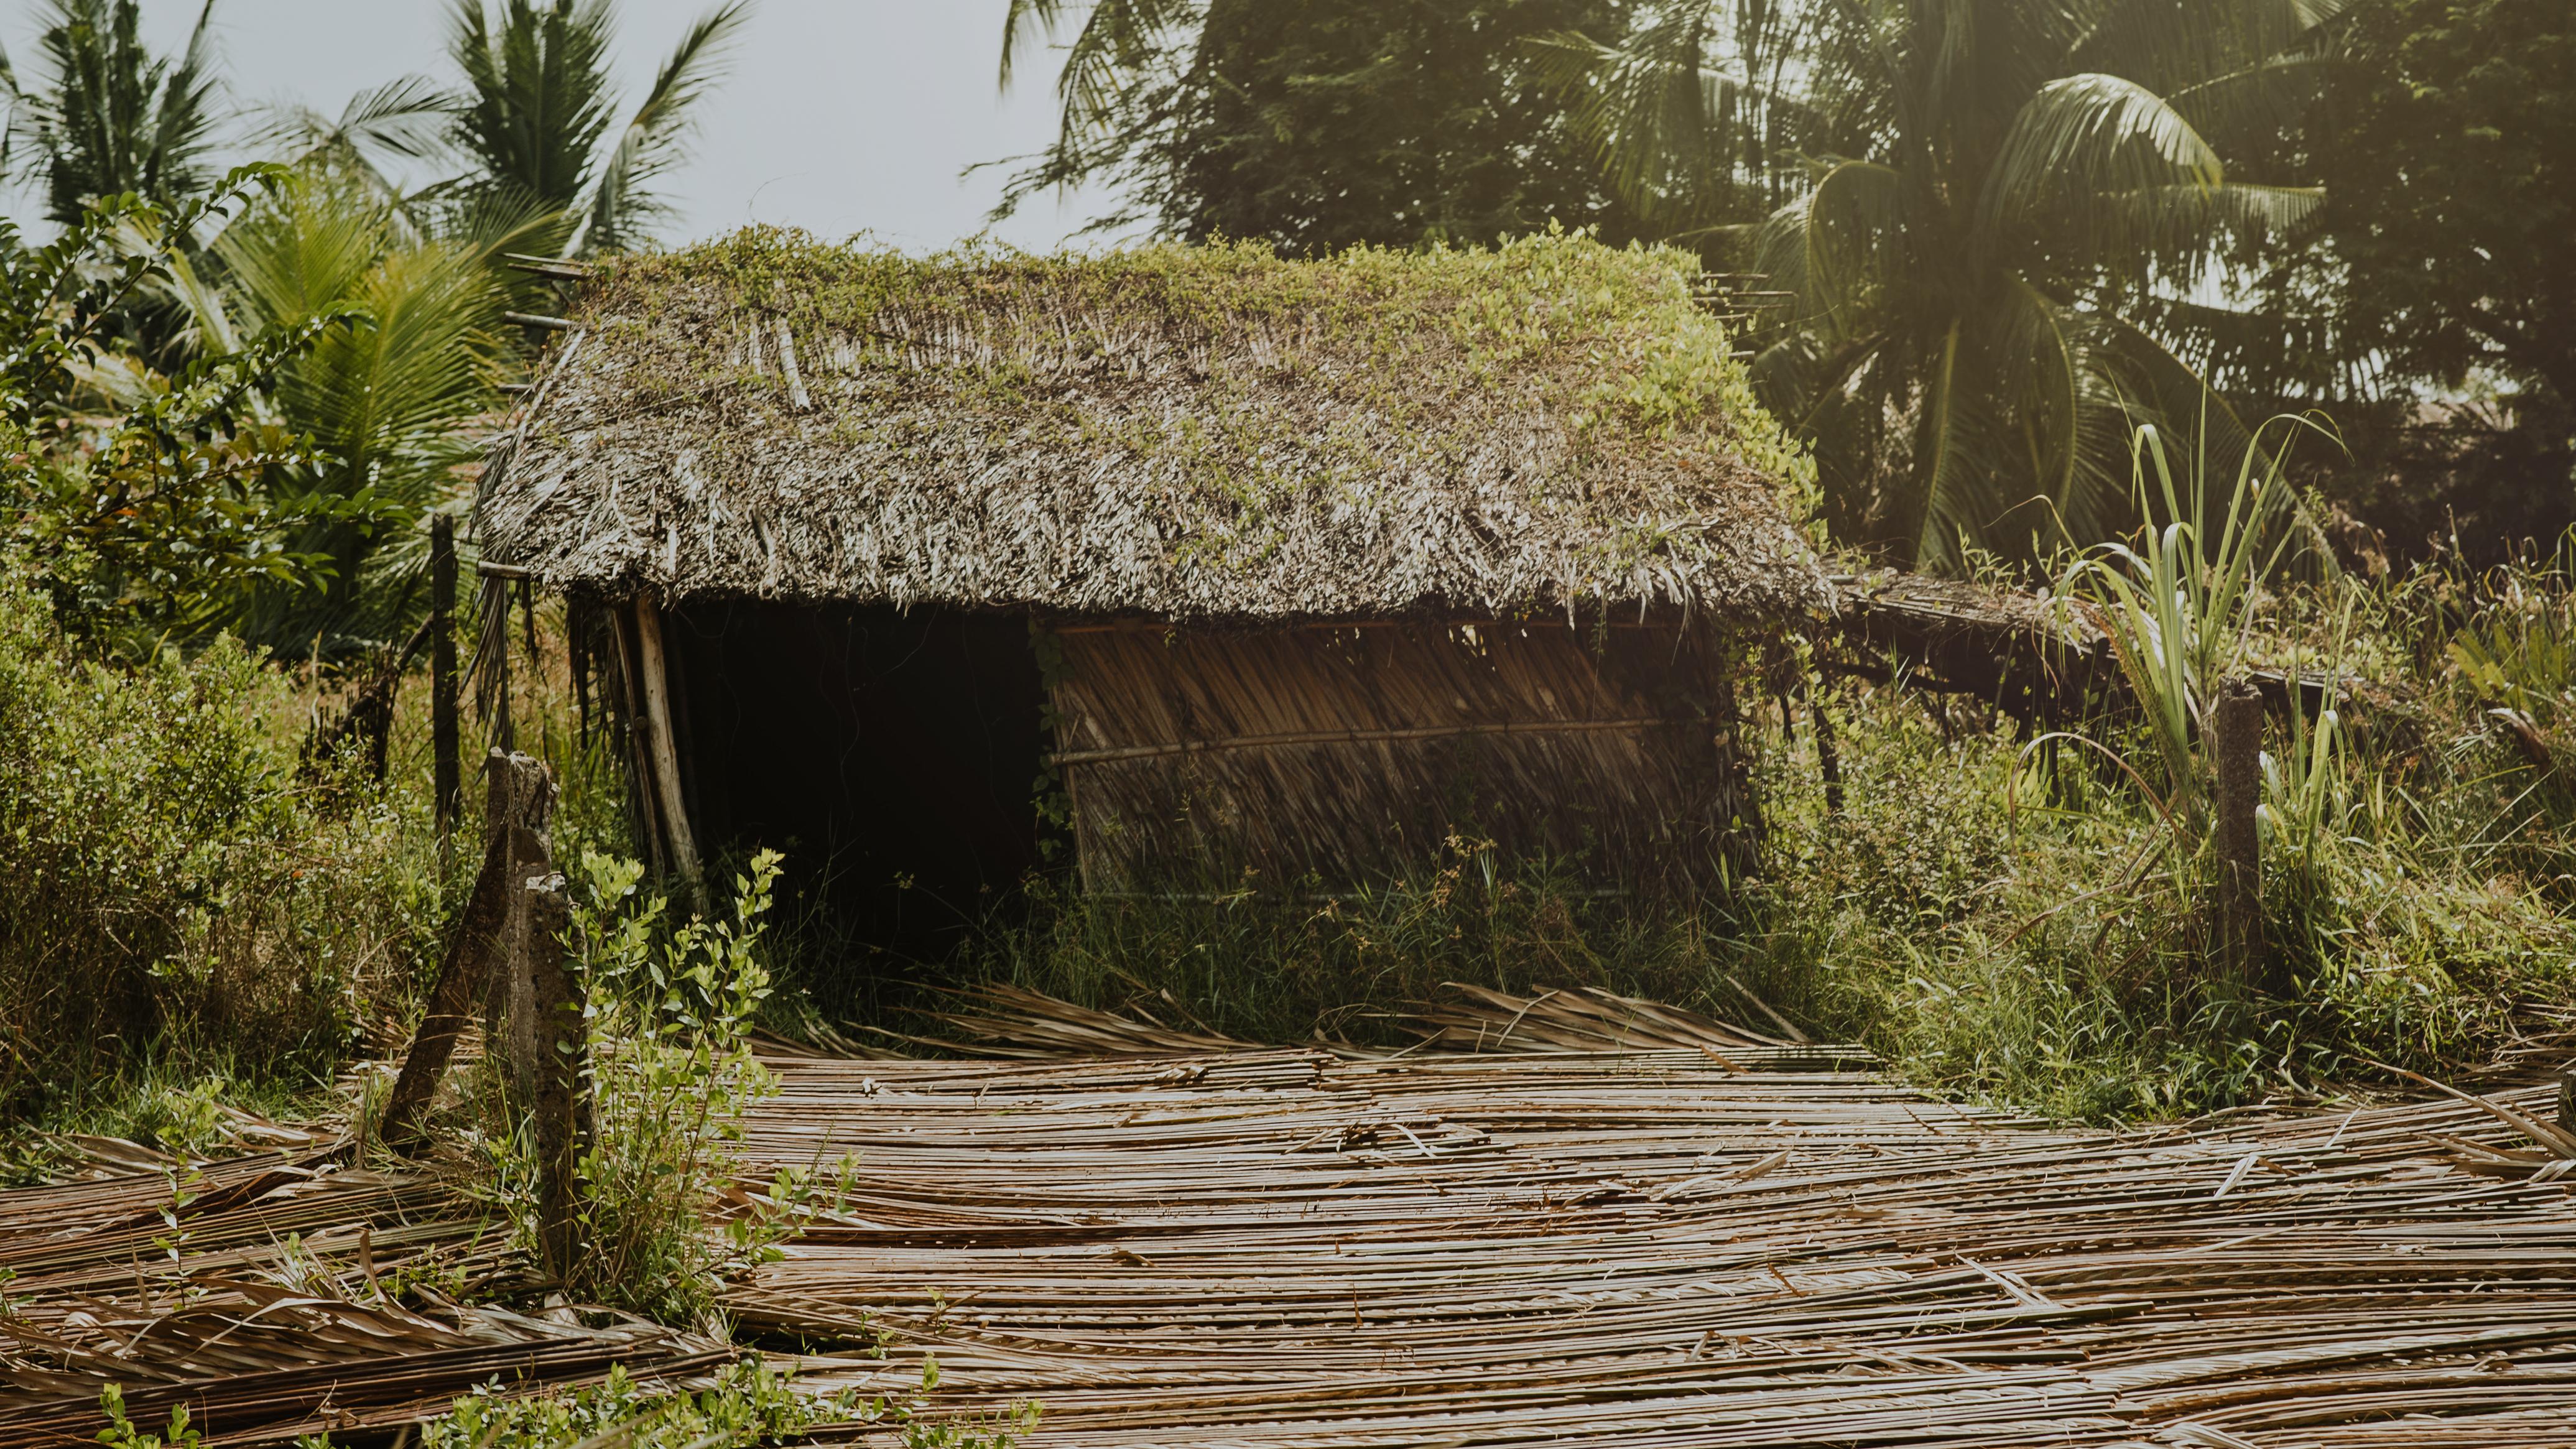 Free Images : daylight, farm, forest, house, hut, landscape ...